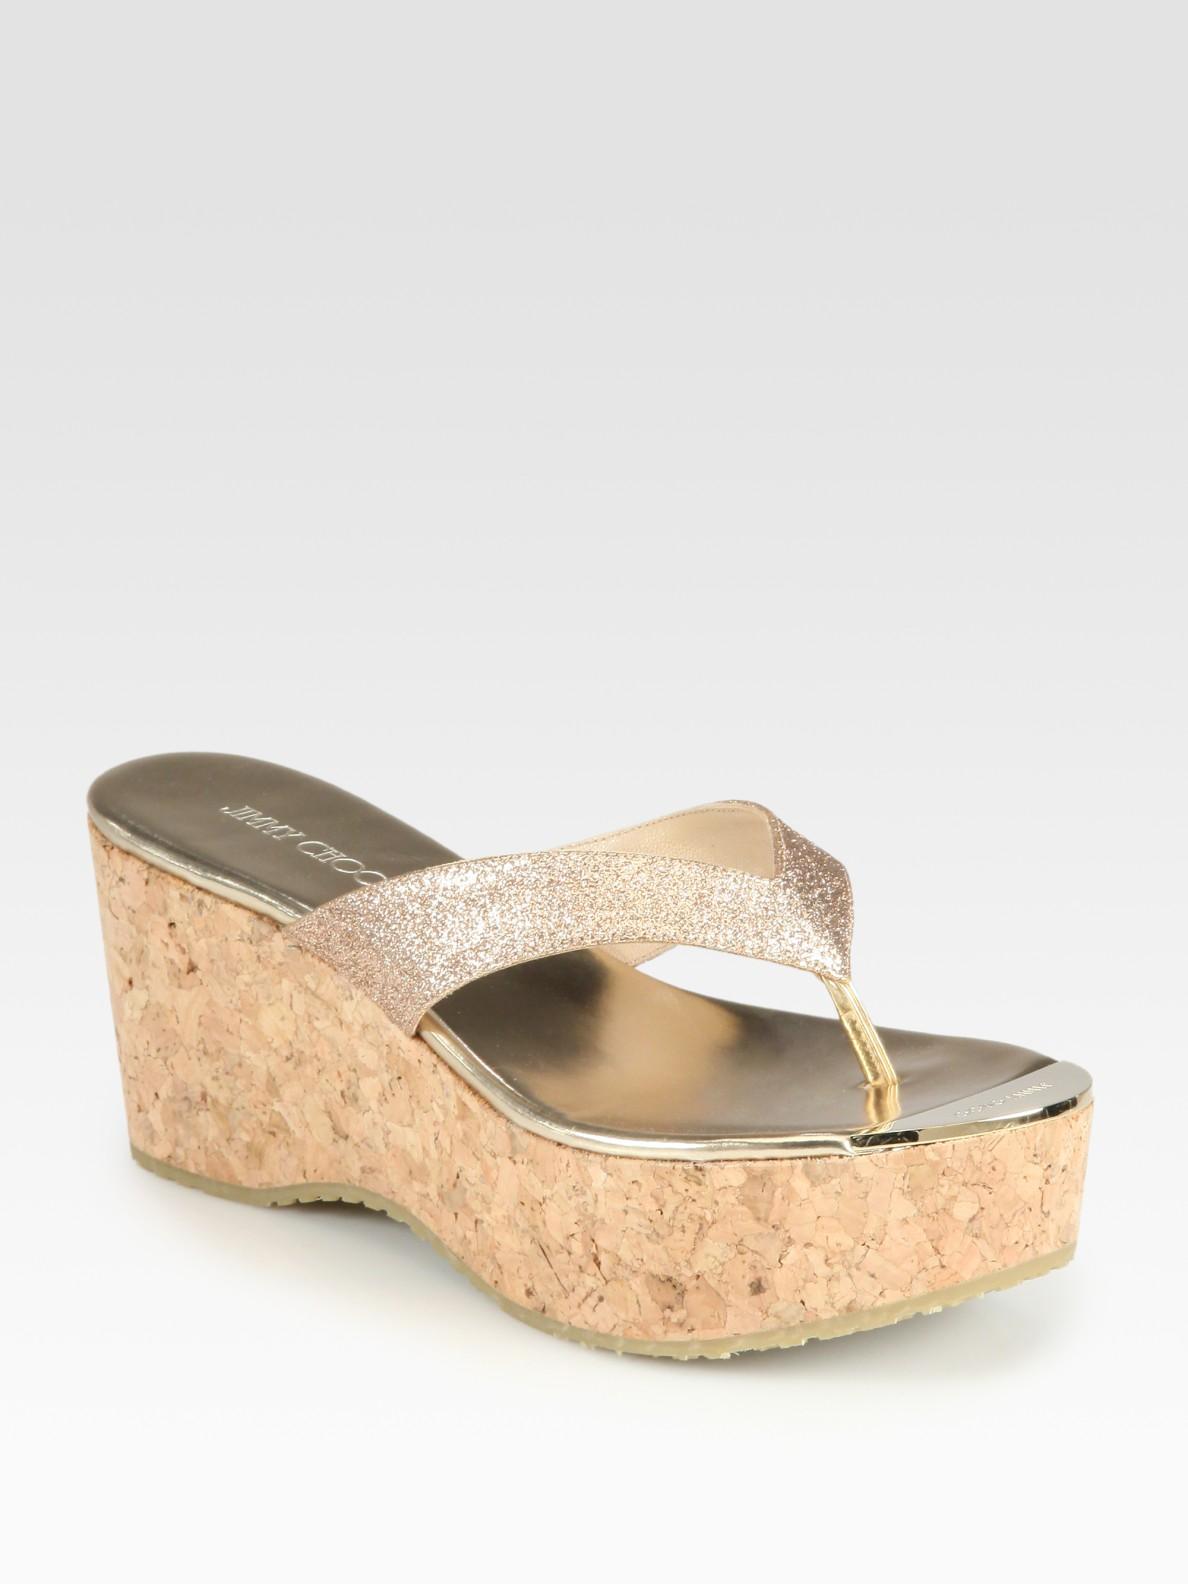 Jimmy Choo Pathos Glitter Cork Wedge Sandals In Natural Lyst